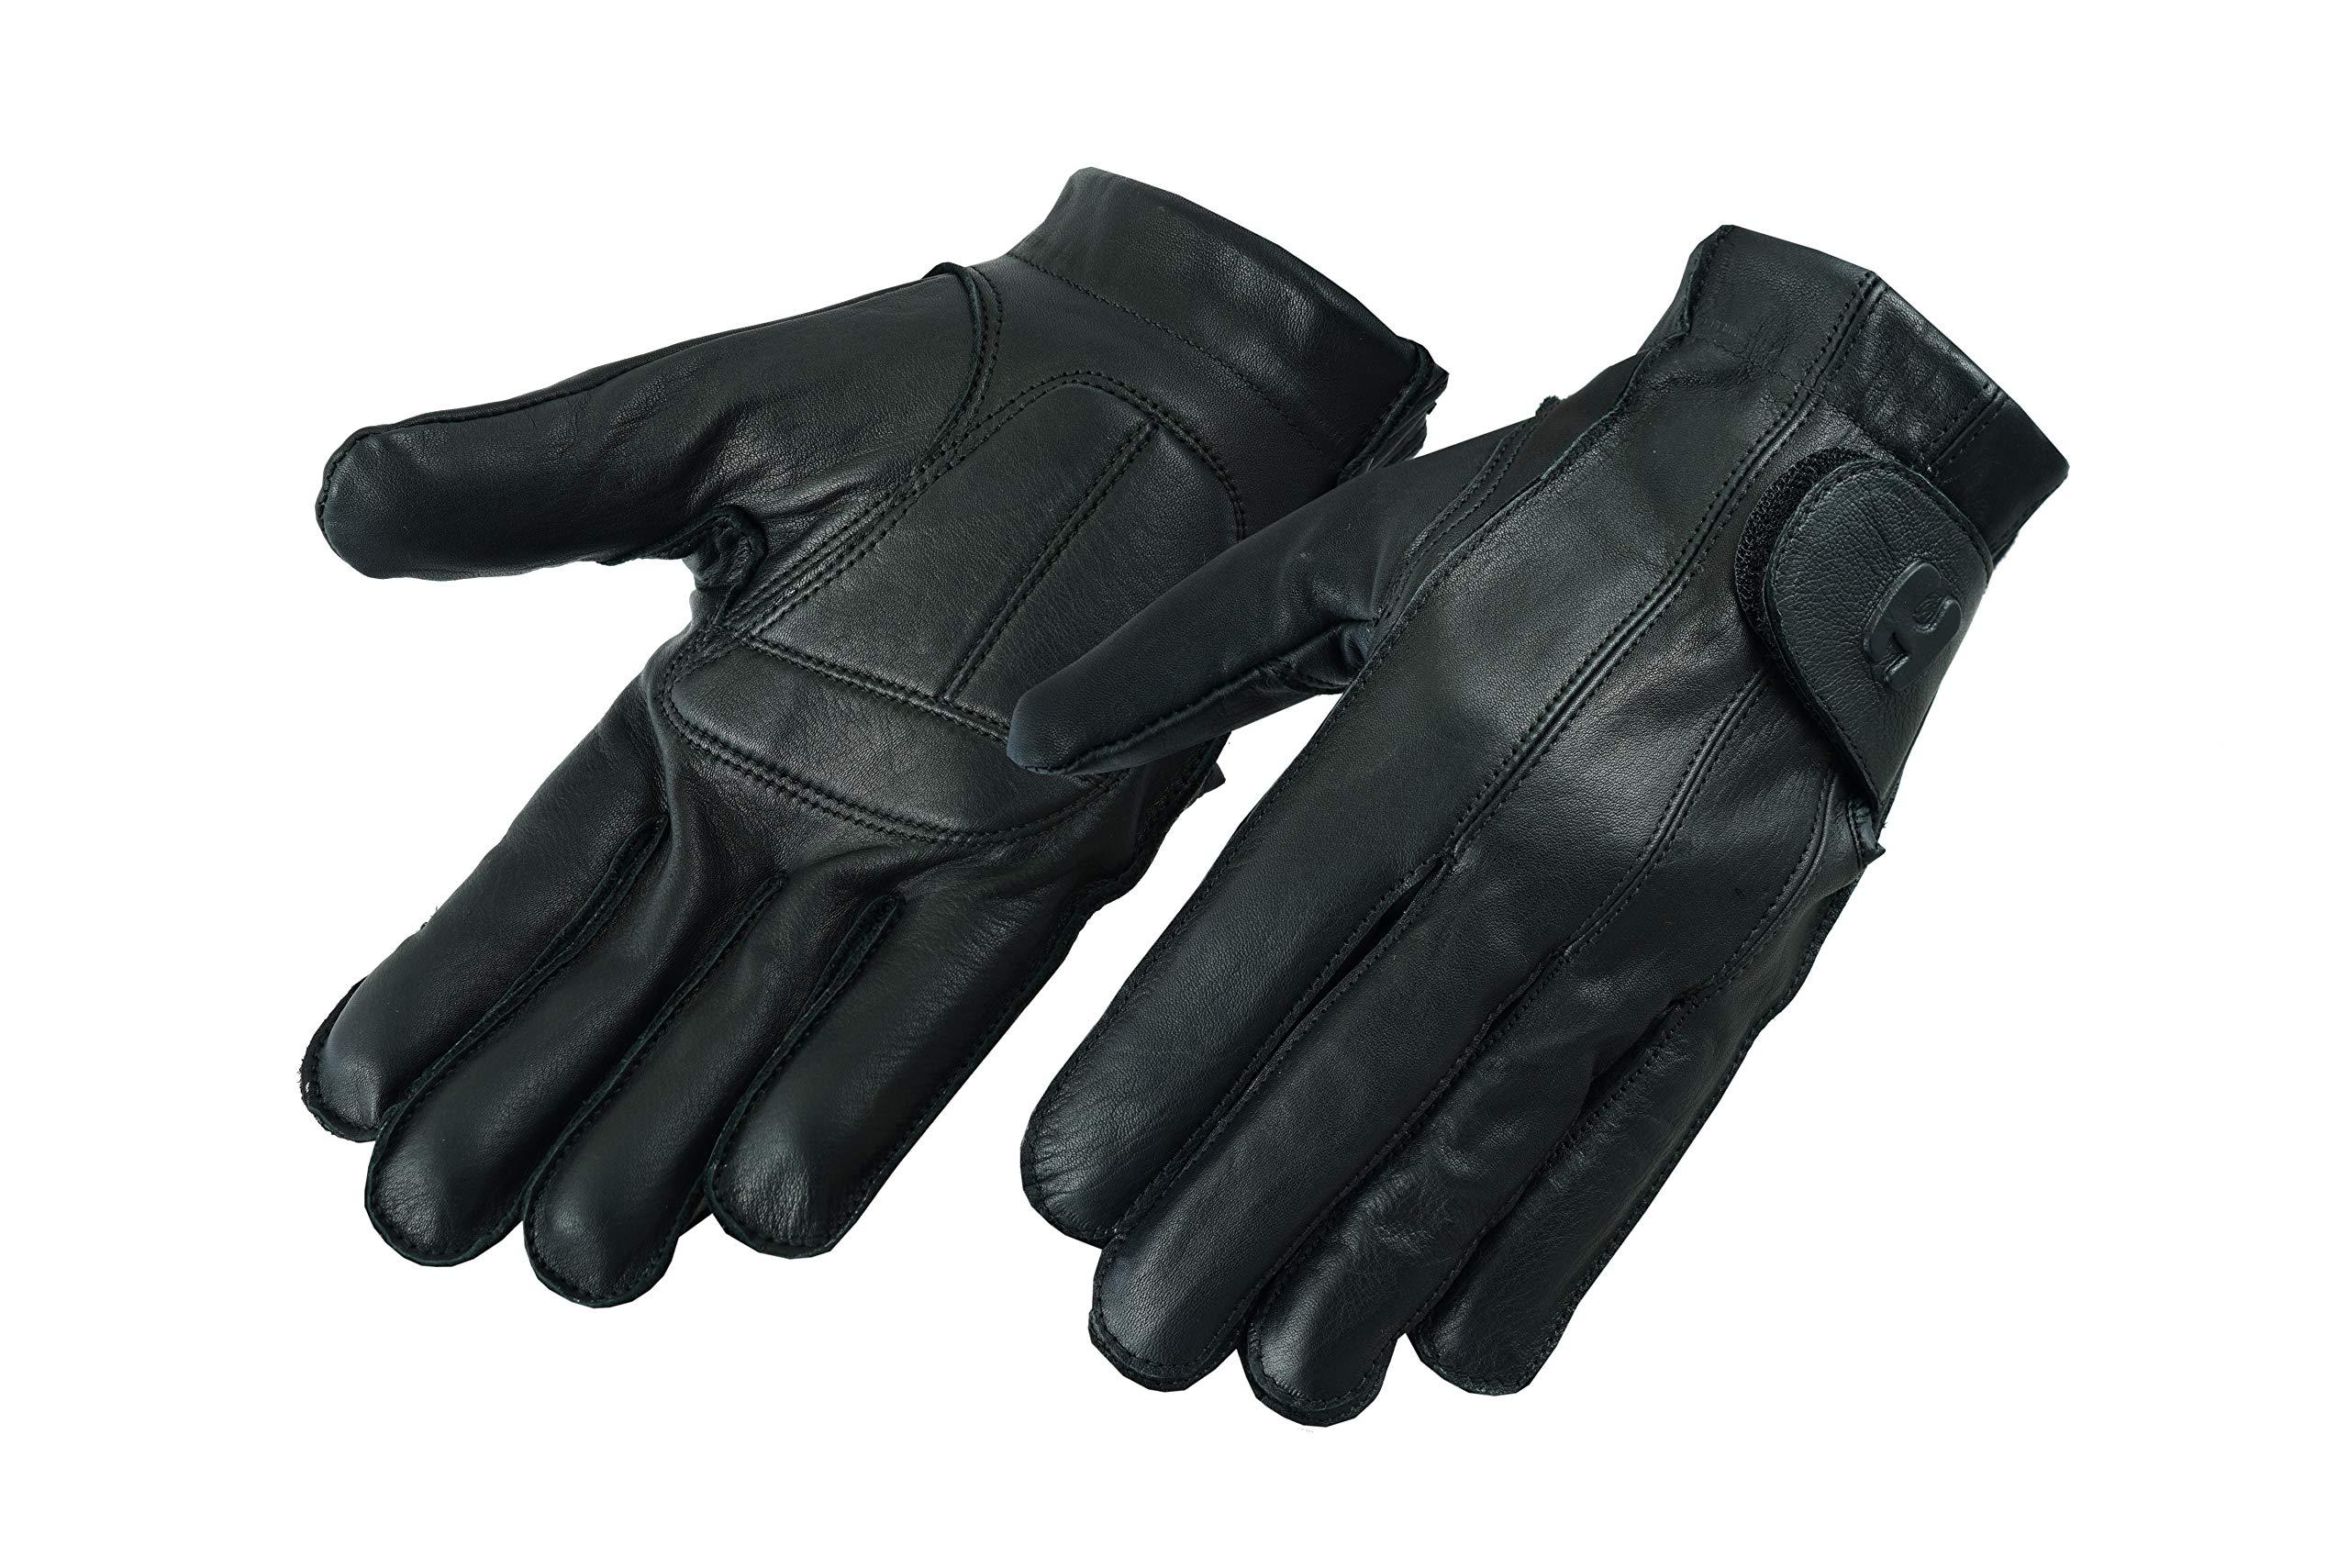 Deer Soft Gel-Padded Palm Fingerless and Full Finger Styles Motorcycle Riding Gloves (XX-Large-Full Finger) by Hugger Glove Company